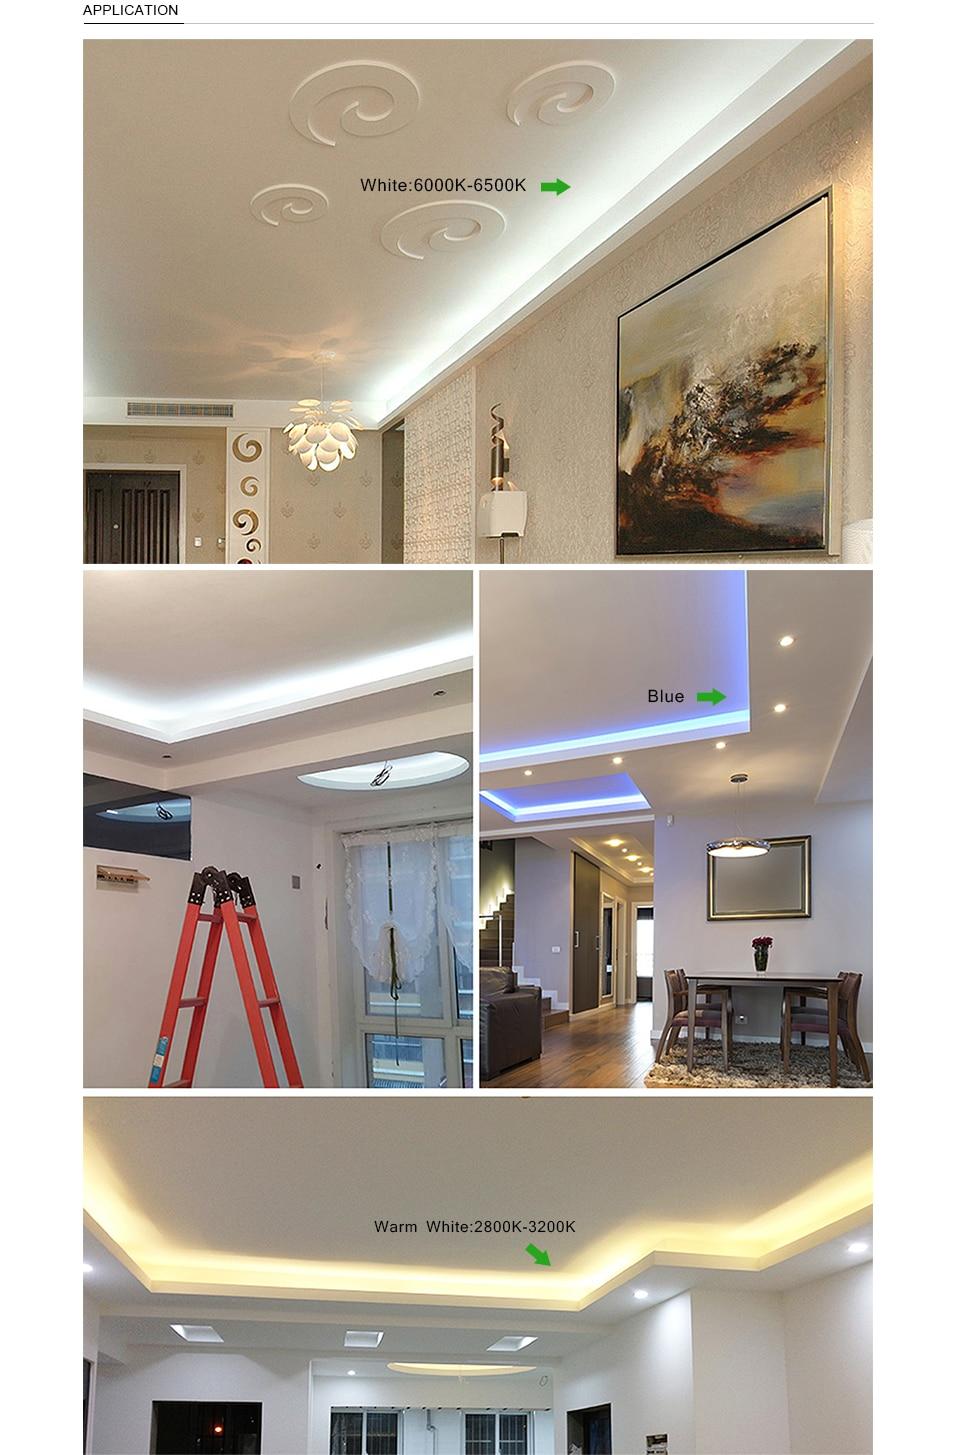 HTB1Jv9CbgMPMeJjy1Xdq6ysrXXaa LED Strip 5050 220V Waterproof Flexible LED light Tape 220V lamp Outdoor String 1M 2M 3M 4M 5M 10M 12M 15M 20M 25M 60LEDs/M